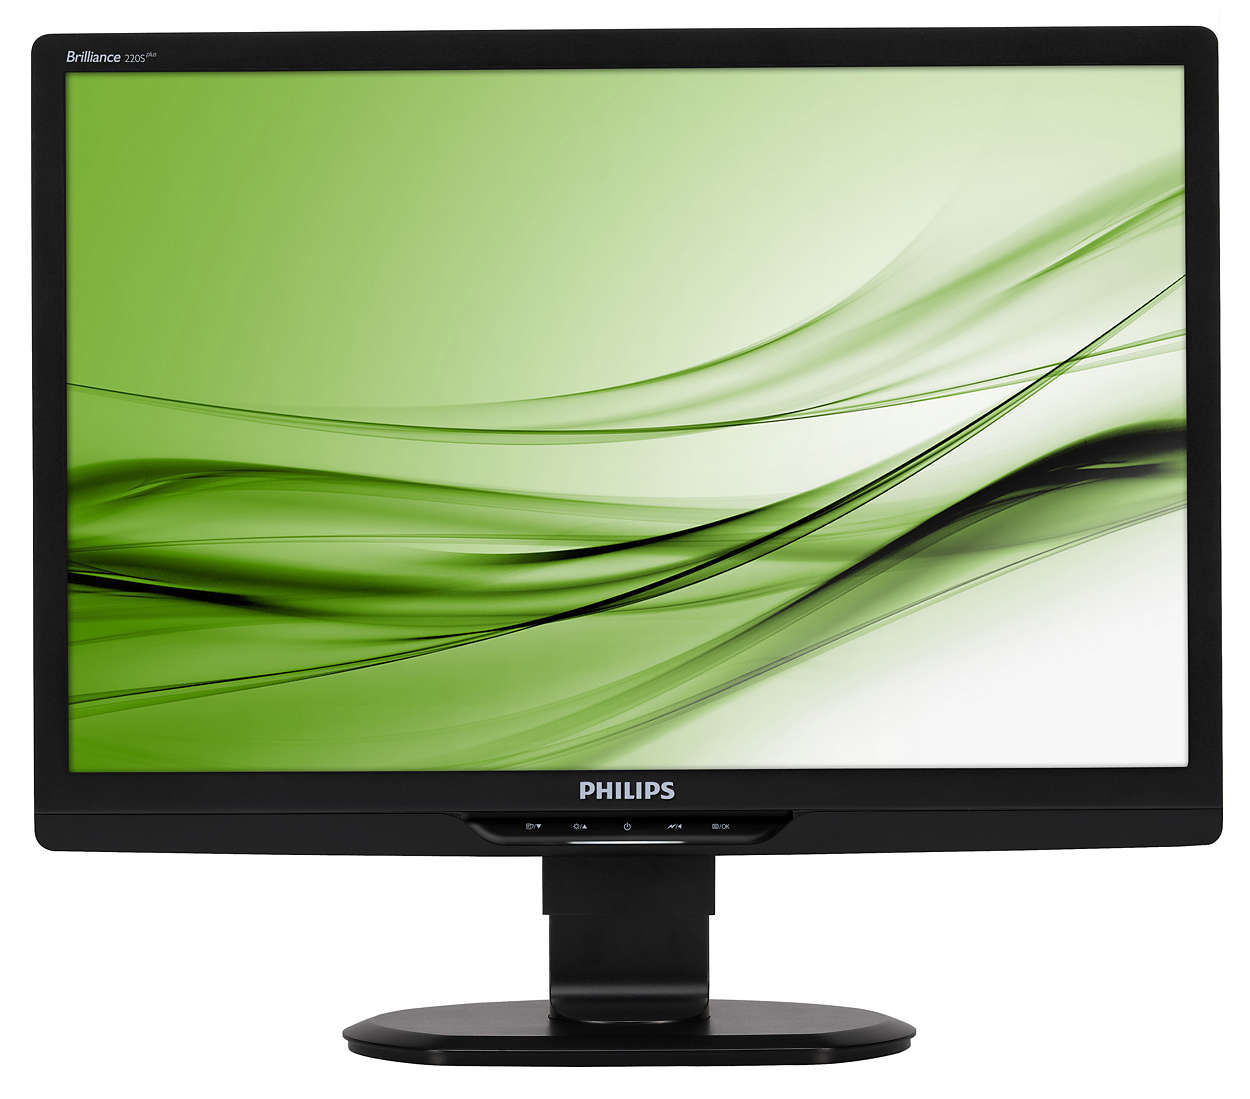 Ergonomisk skærm øger produktiviteten